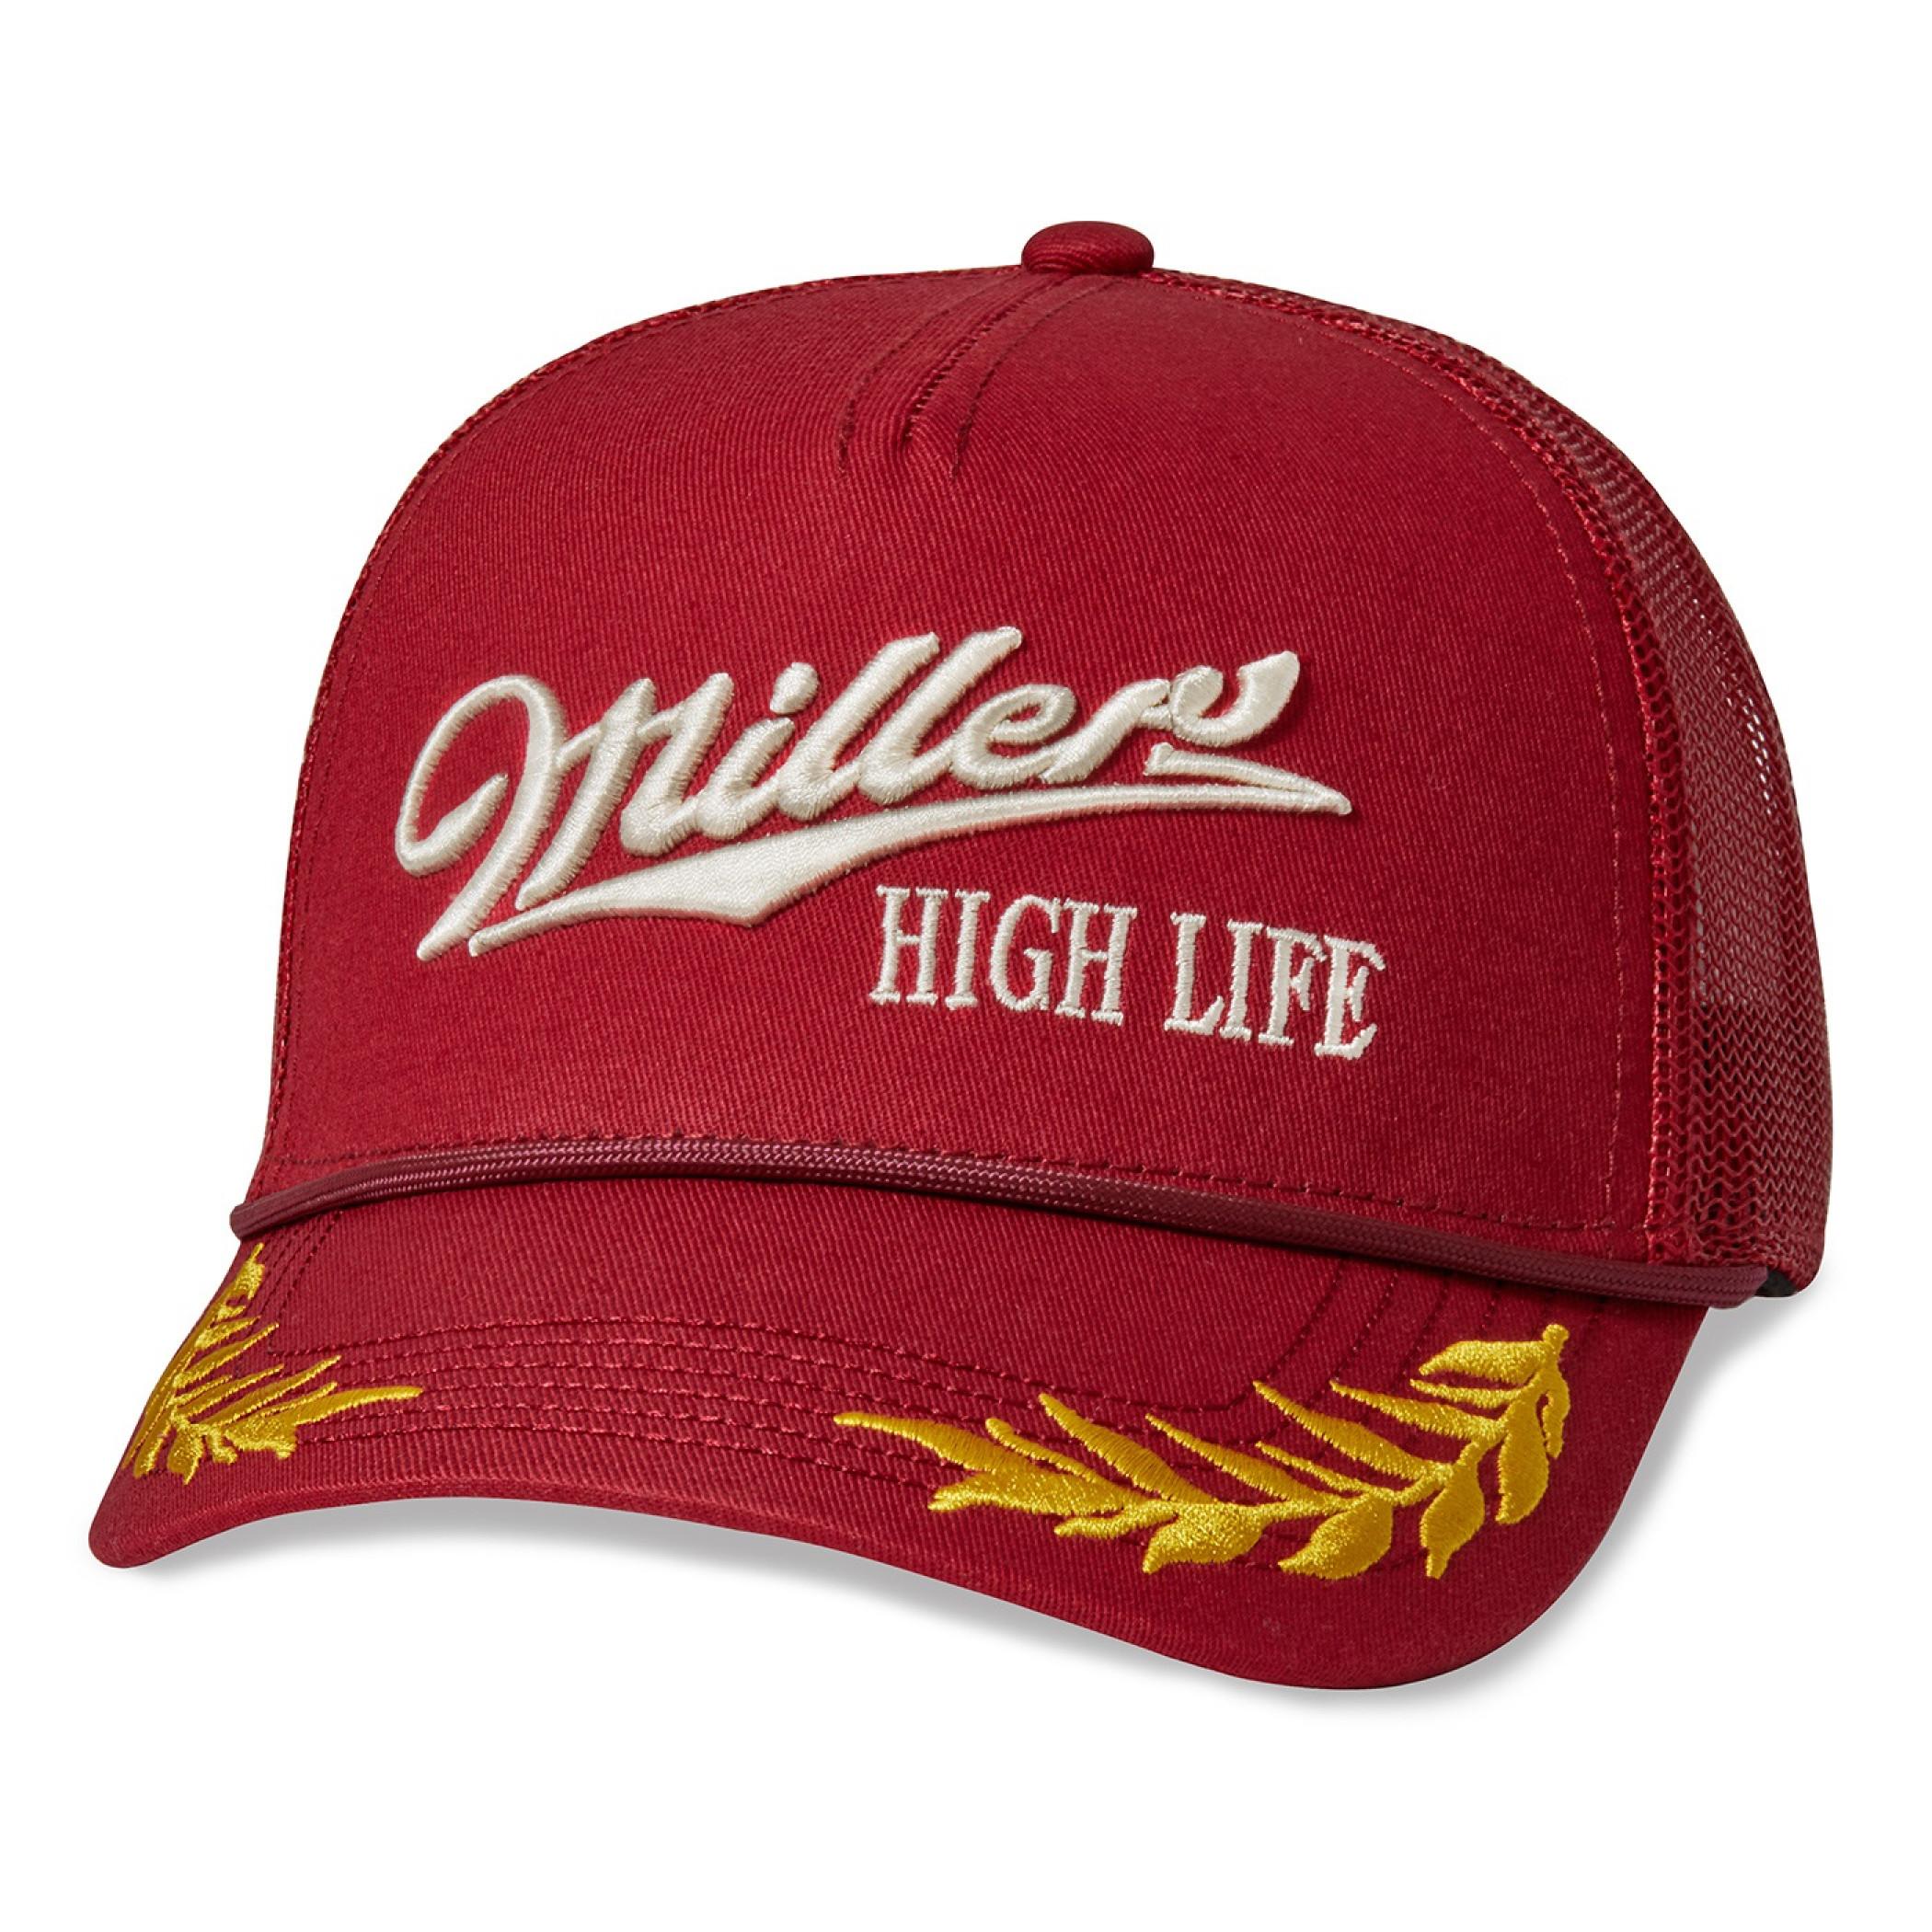 Miller High Life Logo Red Mesh Adjustable Trucker Hat